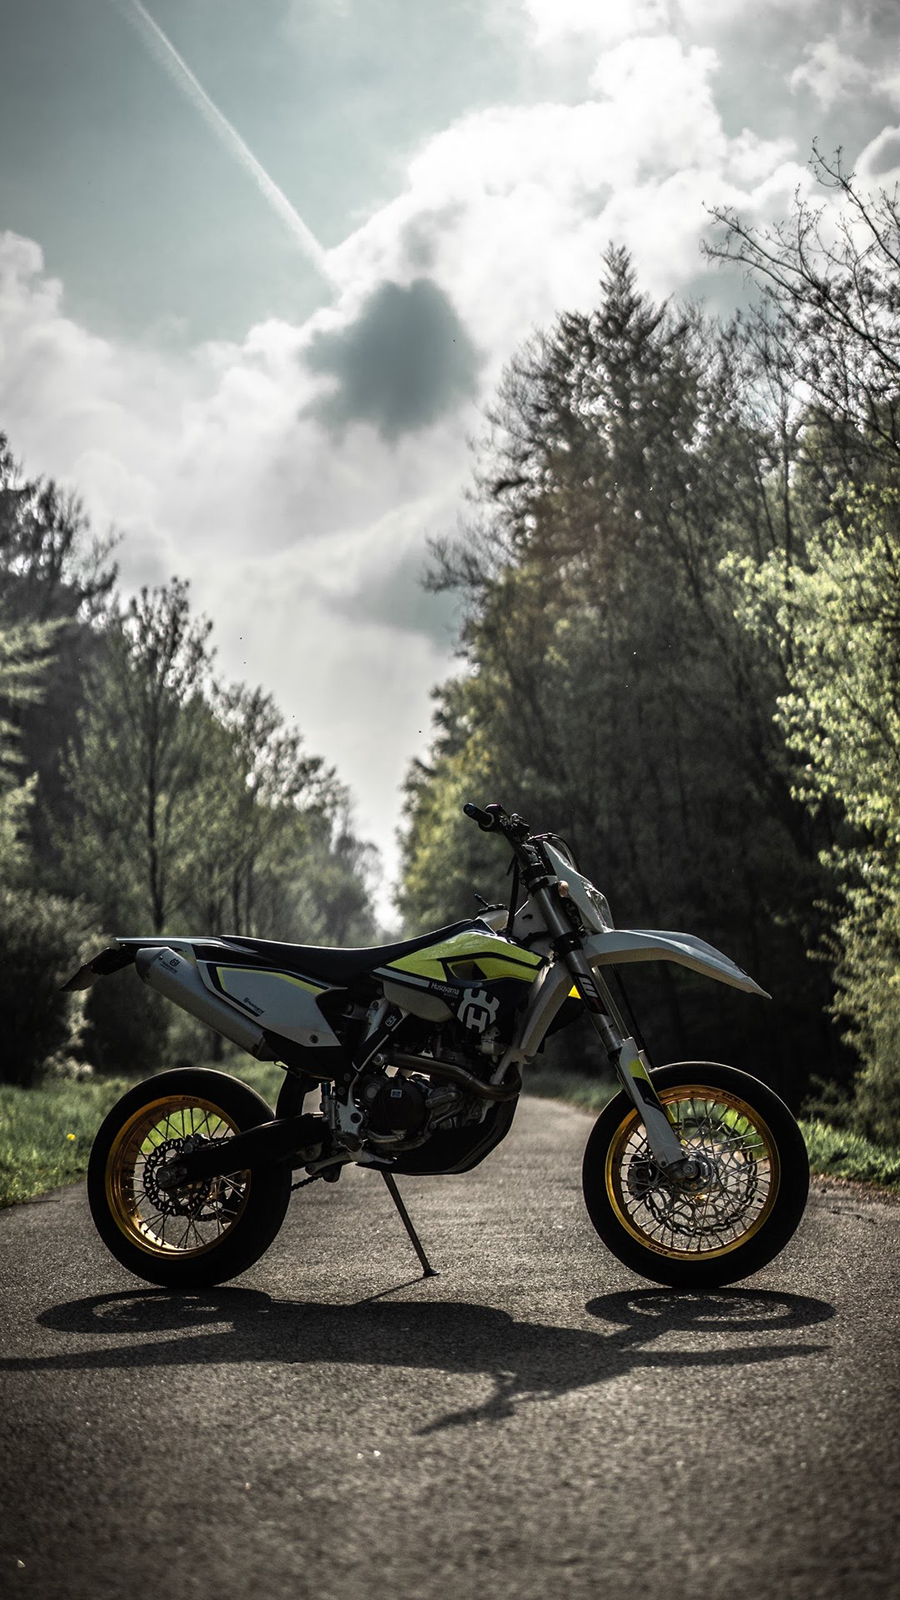 Mountain Bike Wallpapers – Motorcycle Wallpaper Free Download